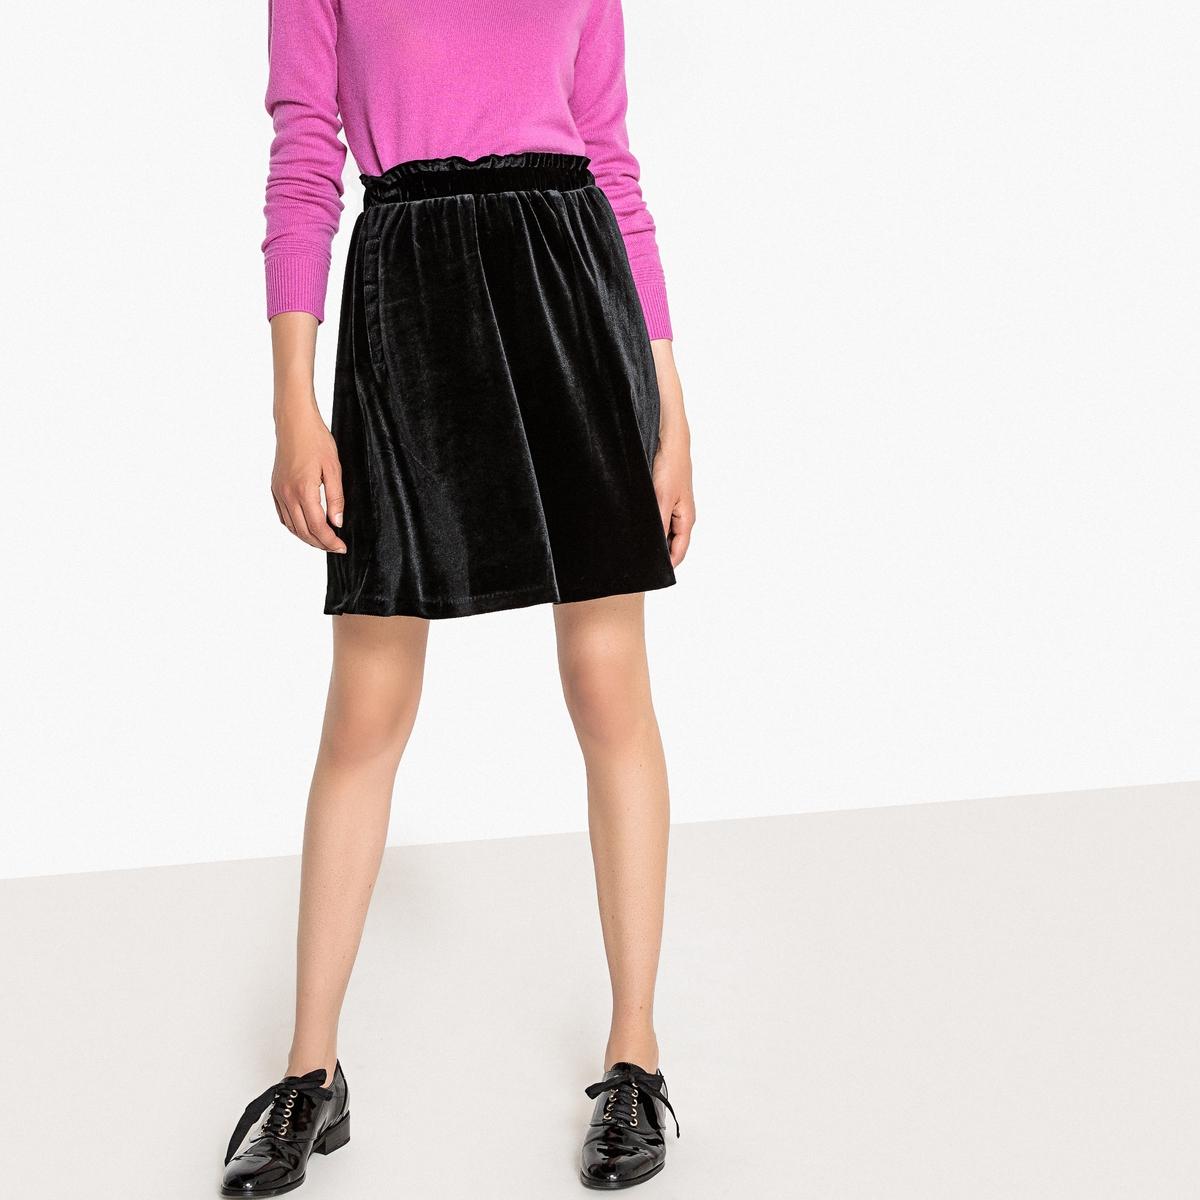 Falda corta de pana